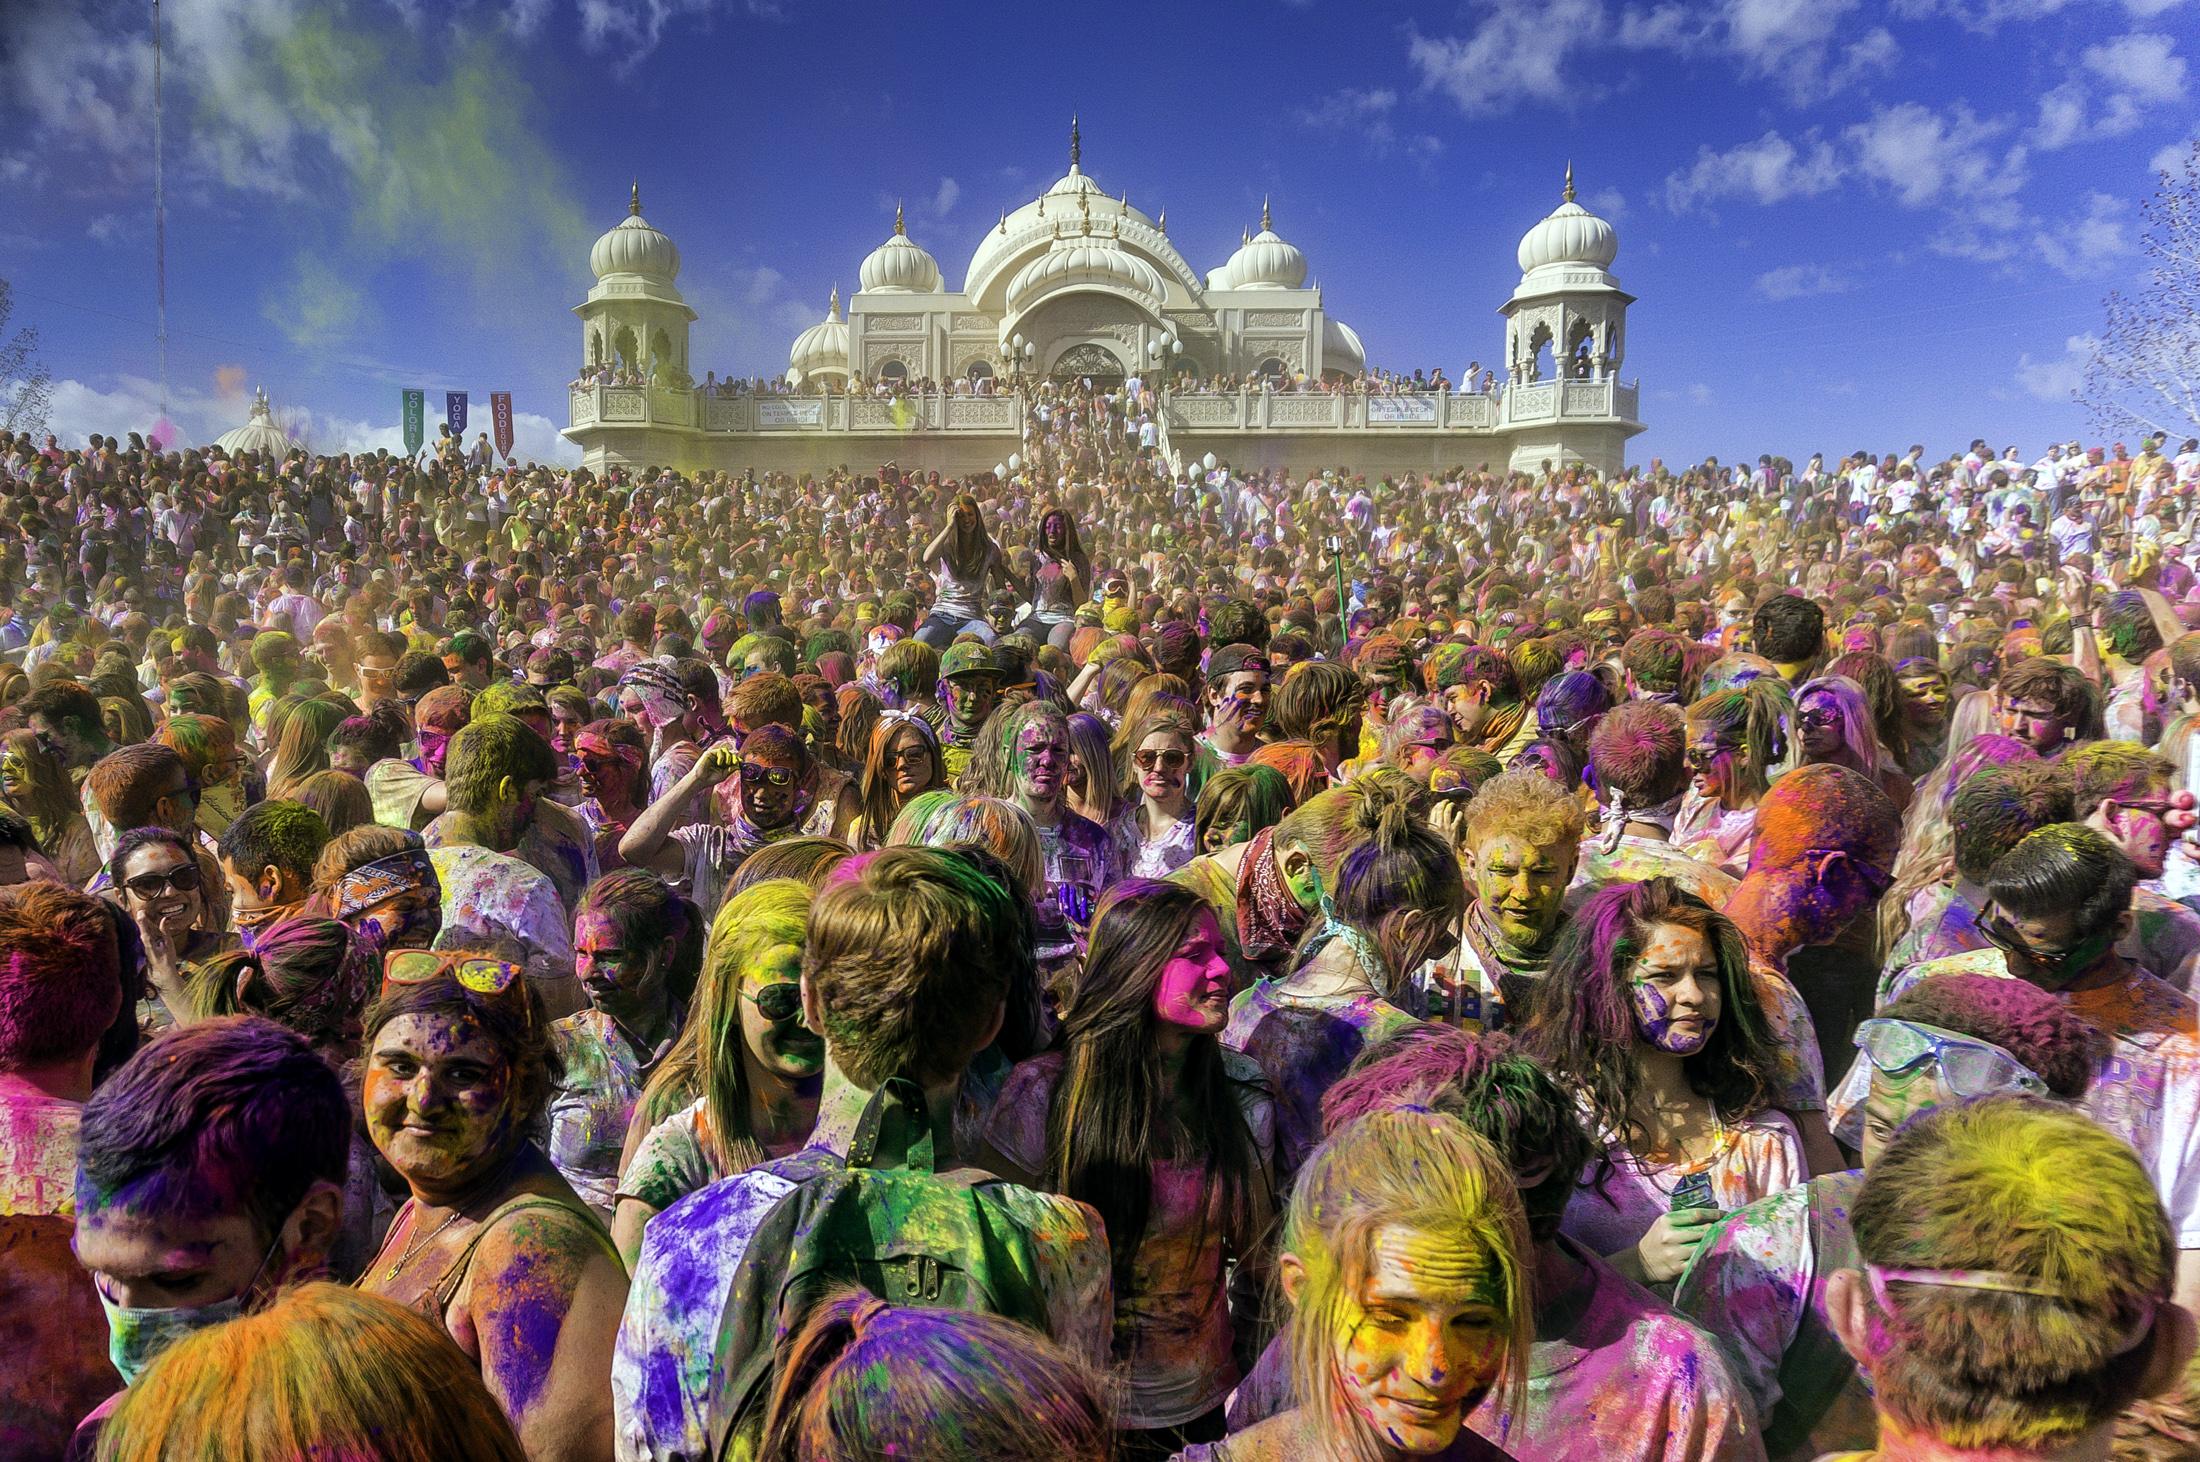 Festival participants enjoy Holi celebrations, replete with colourful powder |  STEVEN GERNER - WIKIMEDIA COMMONS